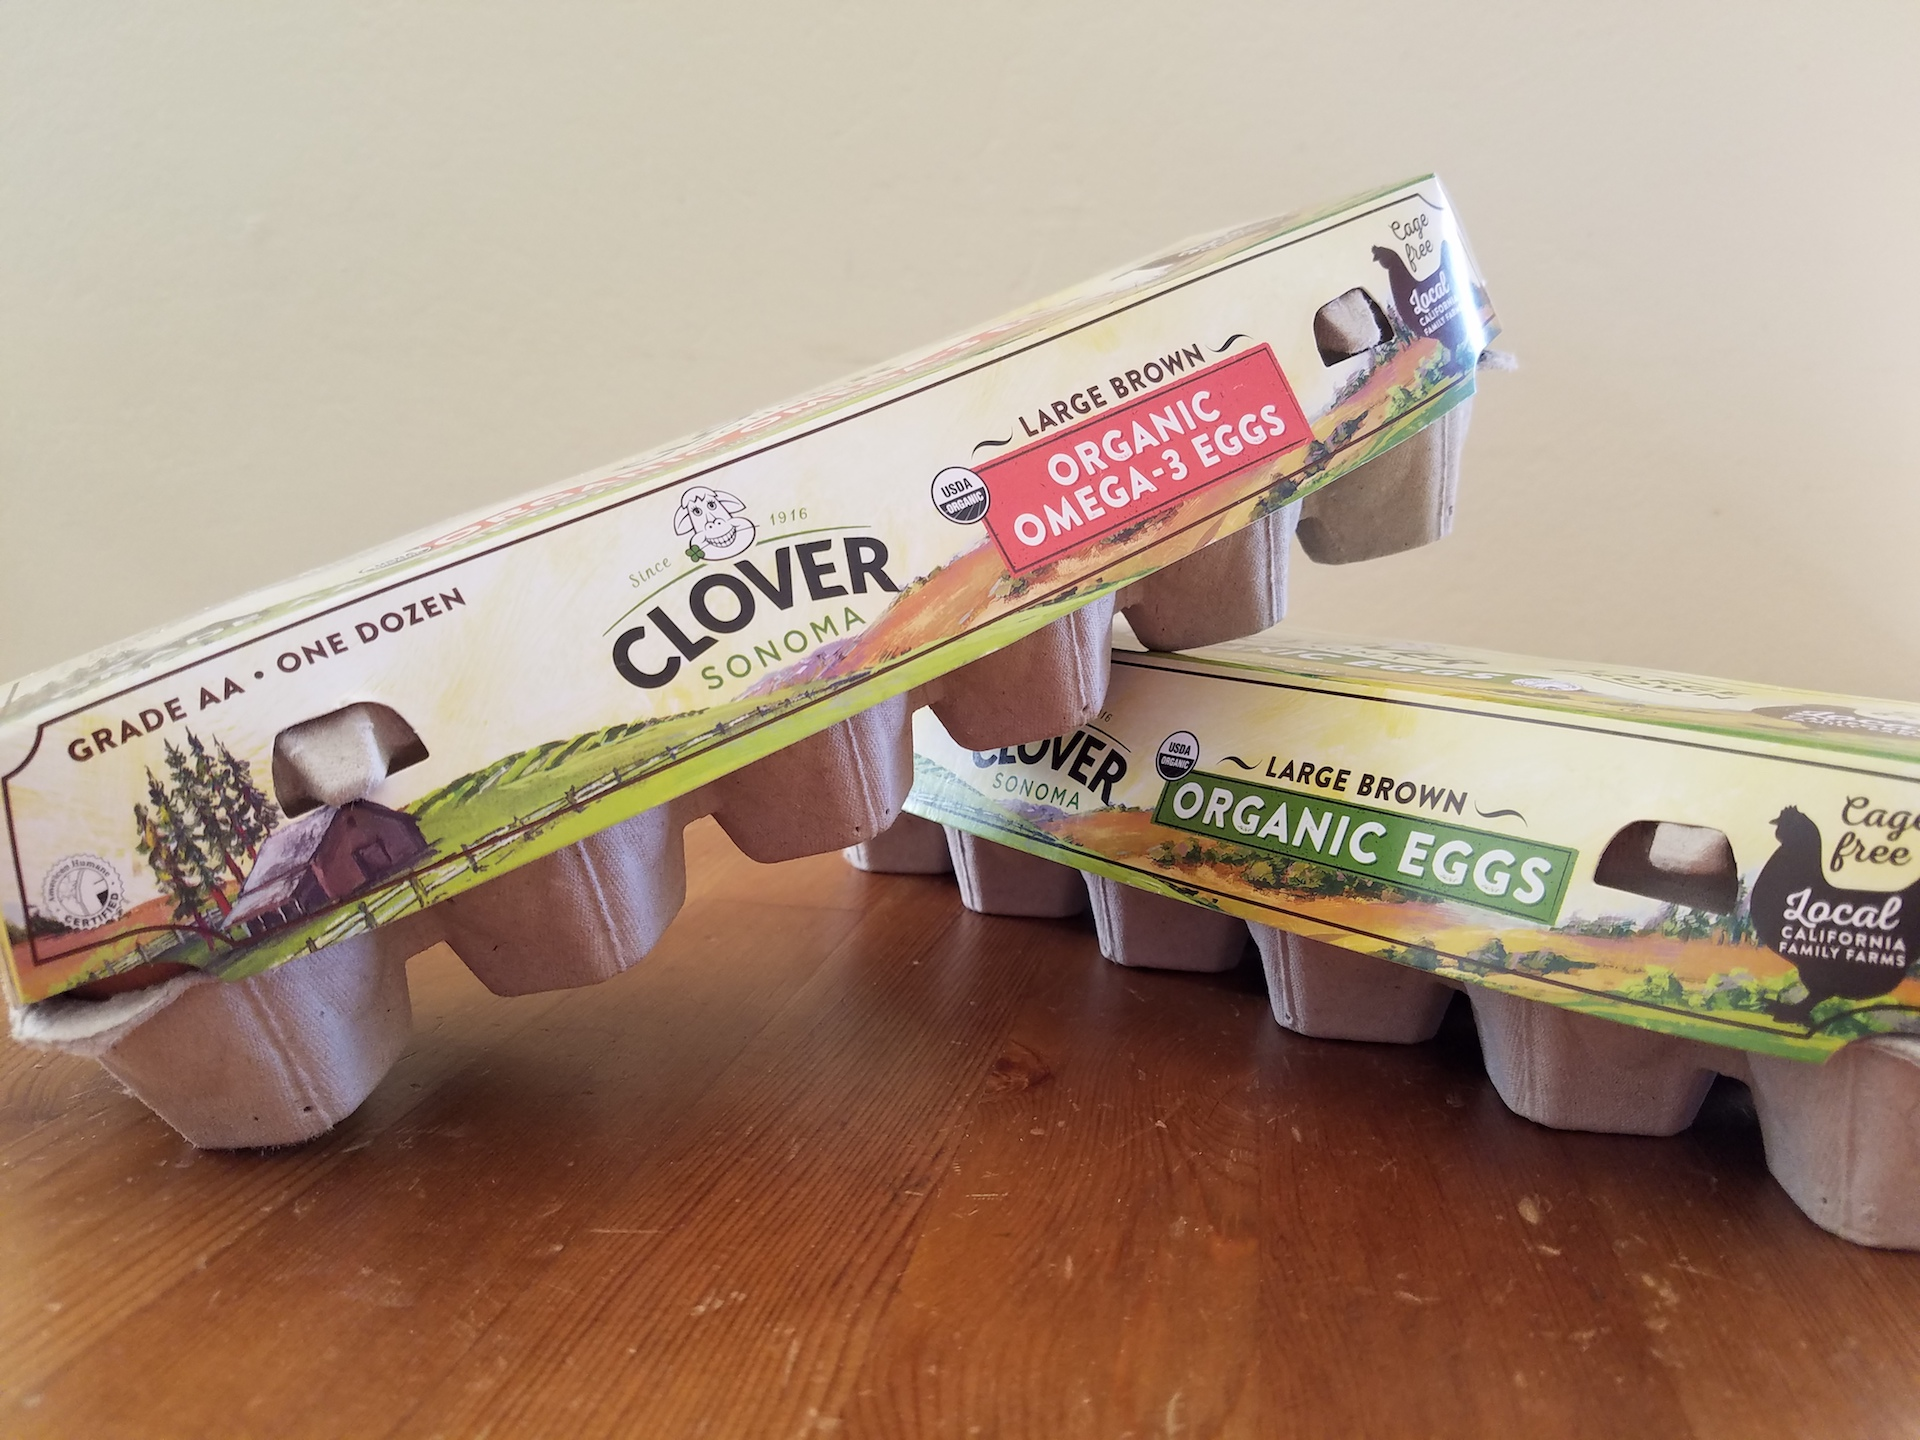 Clover eggs